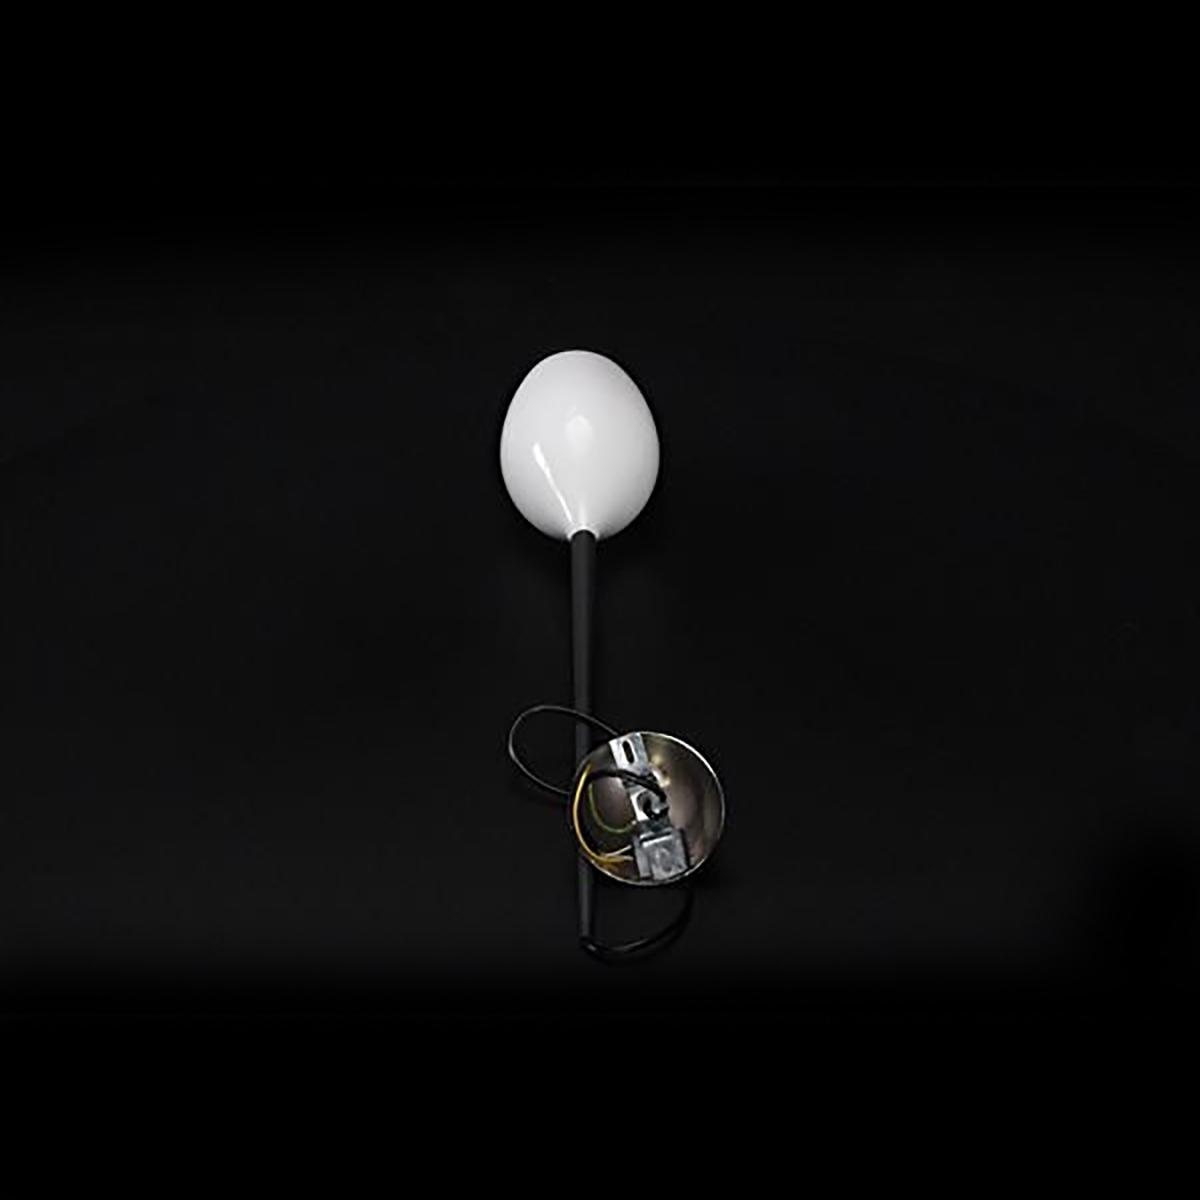 vetta - Lampade led a sospensione - planetitaly - Lampadario ...